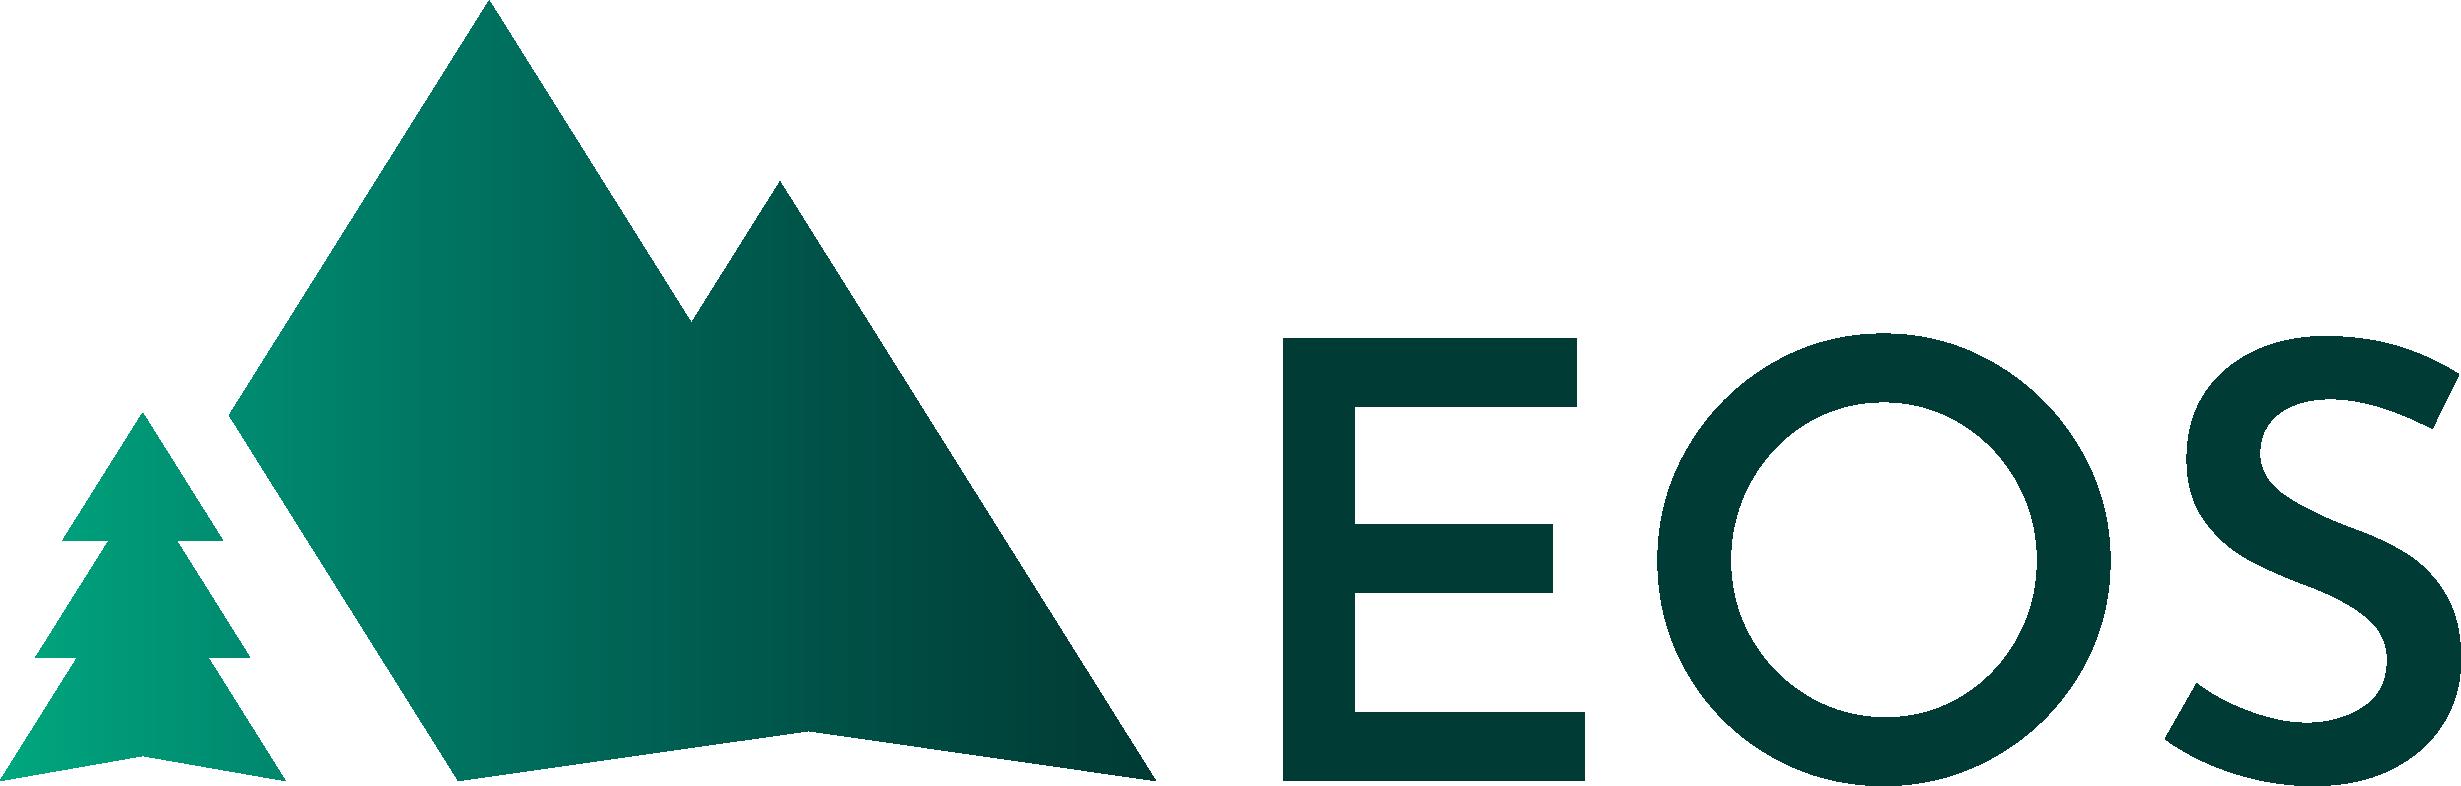 EOS-Logo-COLOR-052319.png